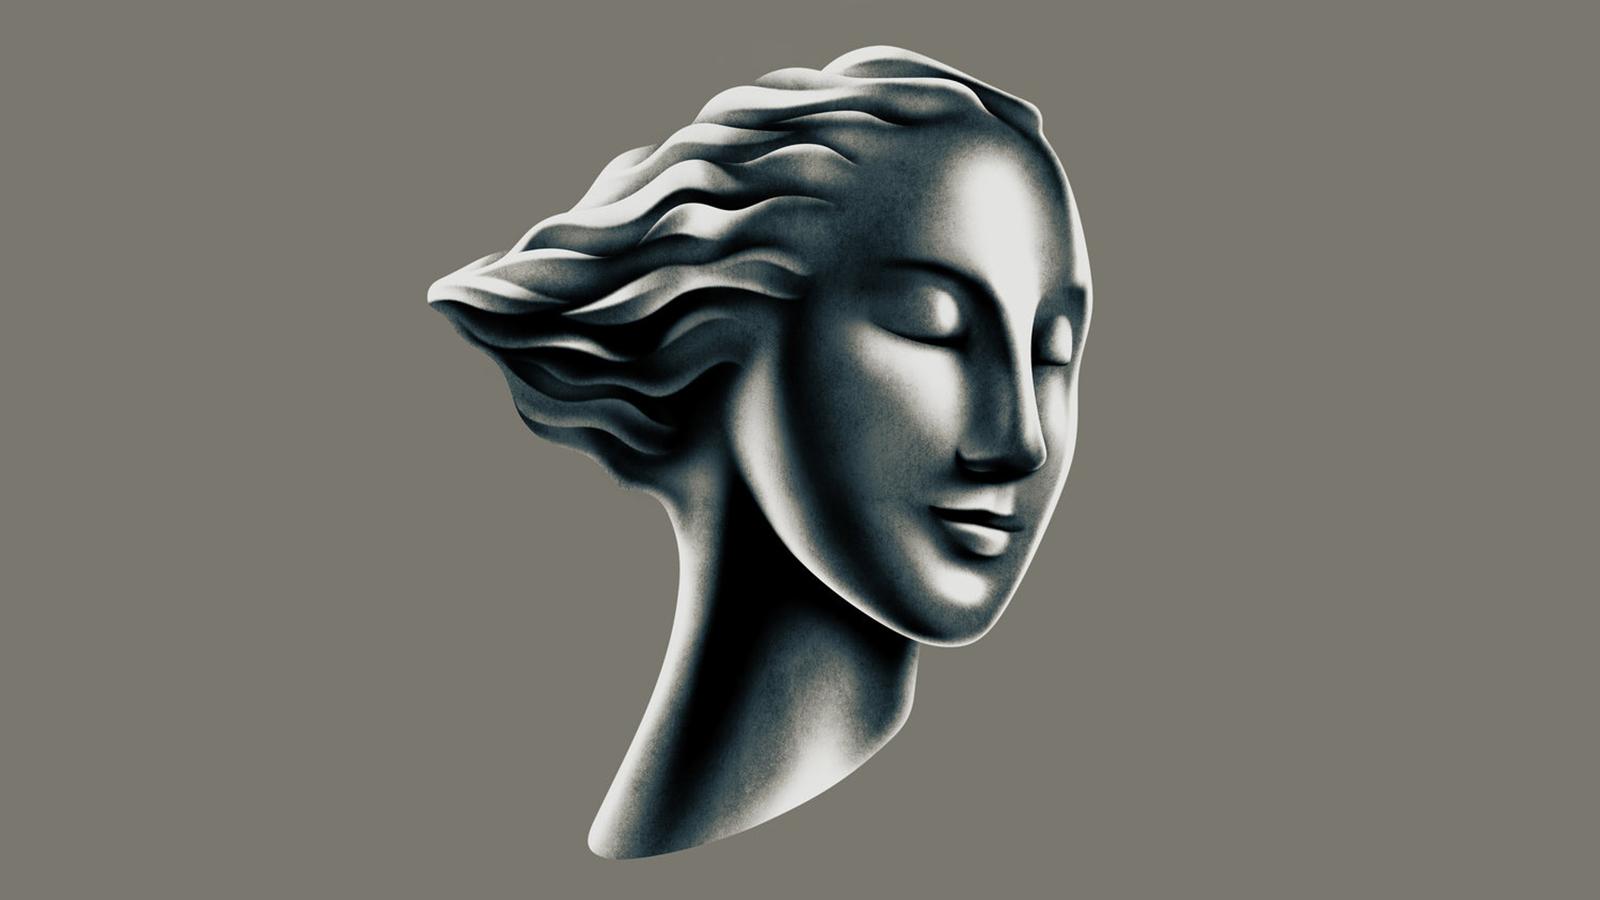 Ivors伊沃学院启动全新的品牌VI视觉形象设计-企业vi设计4